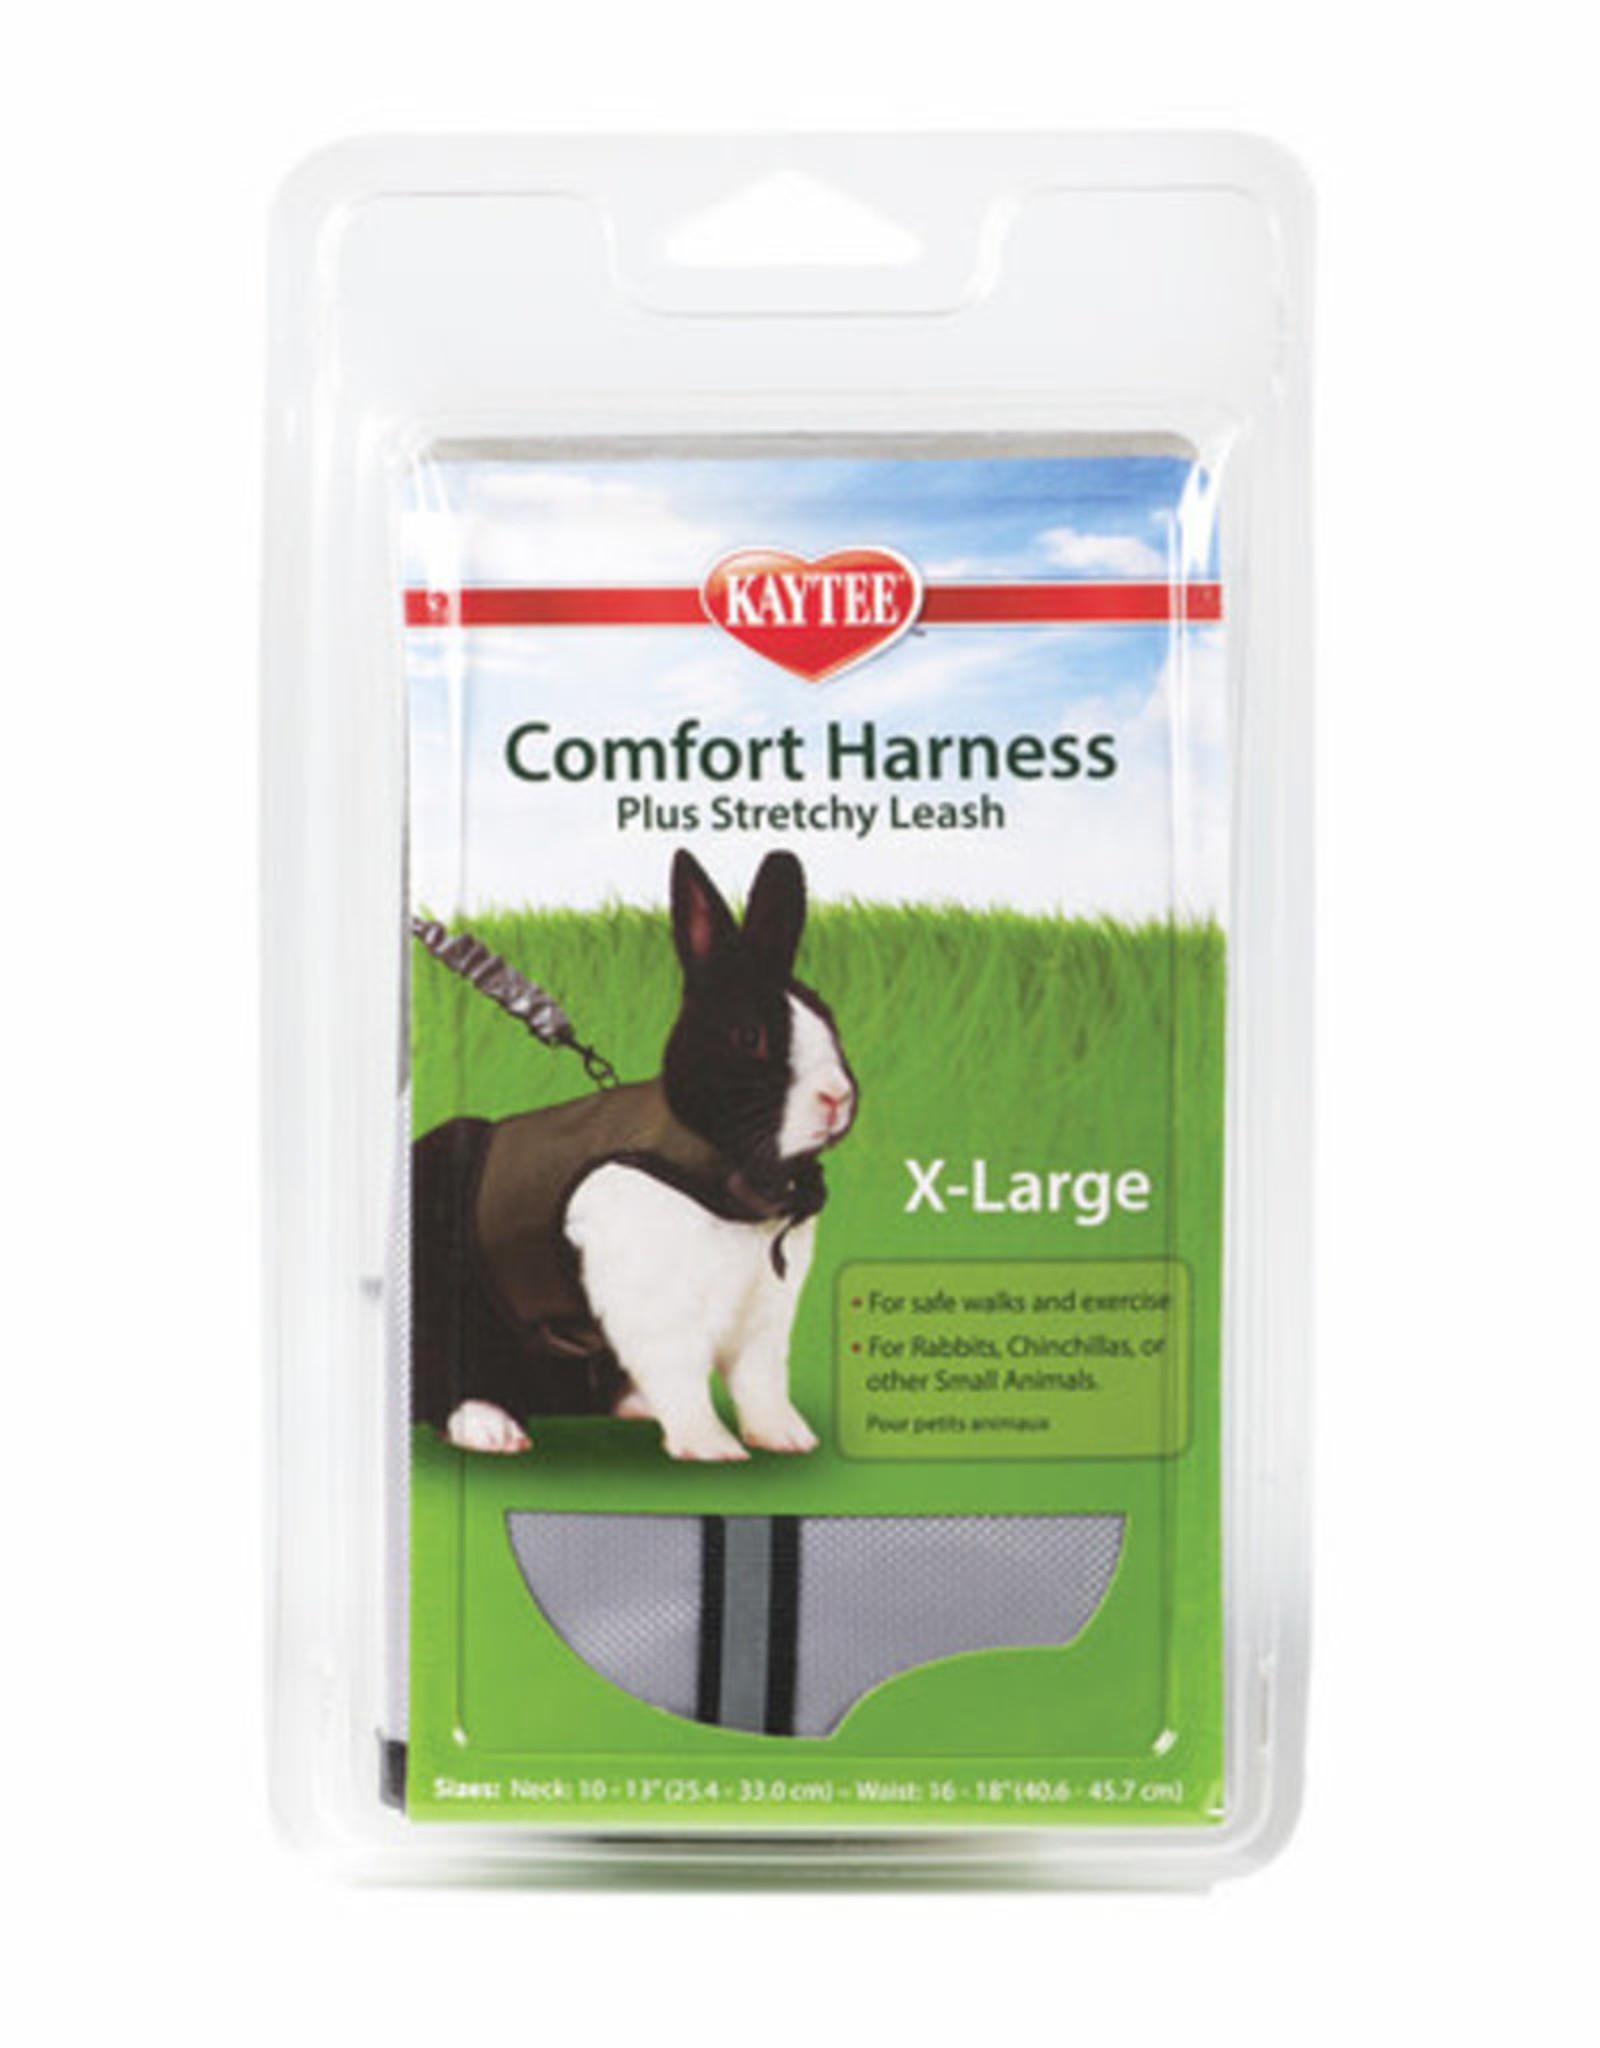 Kaytee Comfort Harness & Stretch Leash X-Large